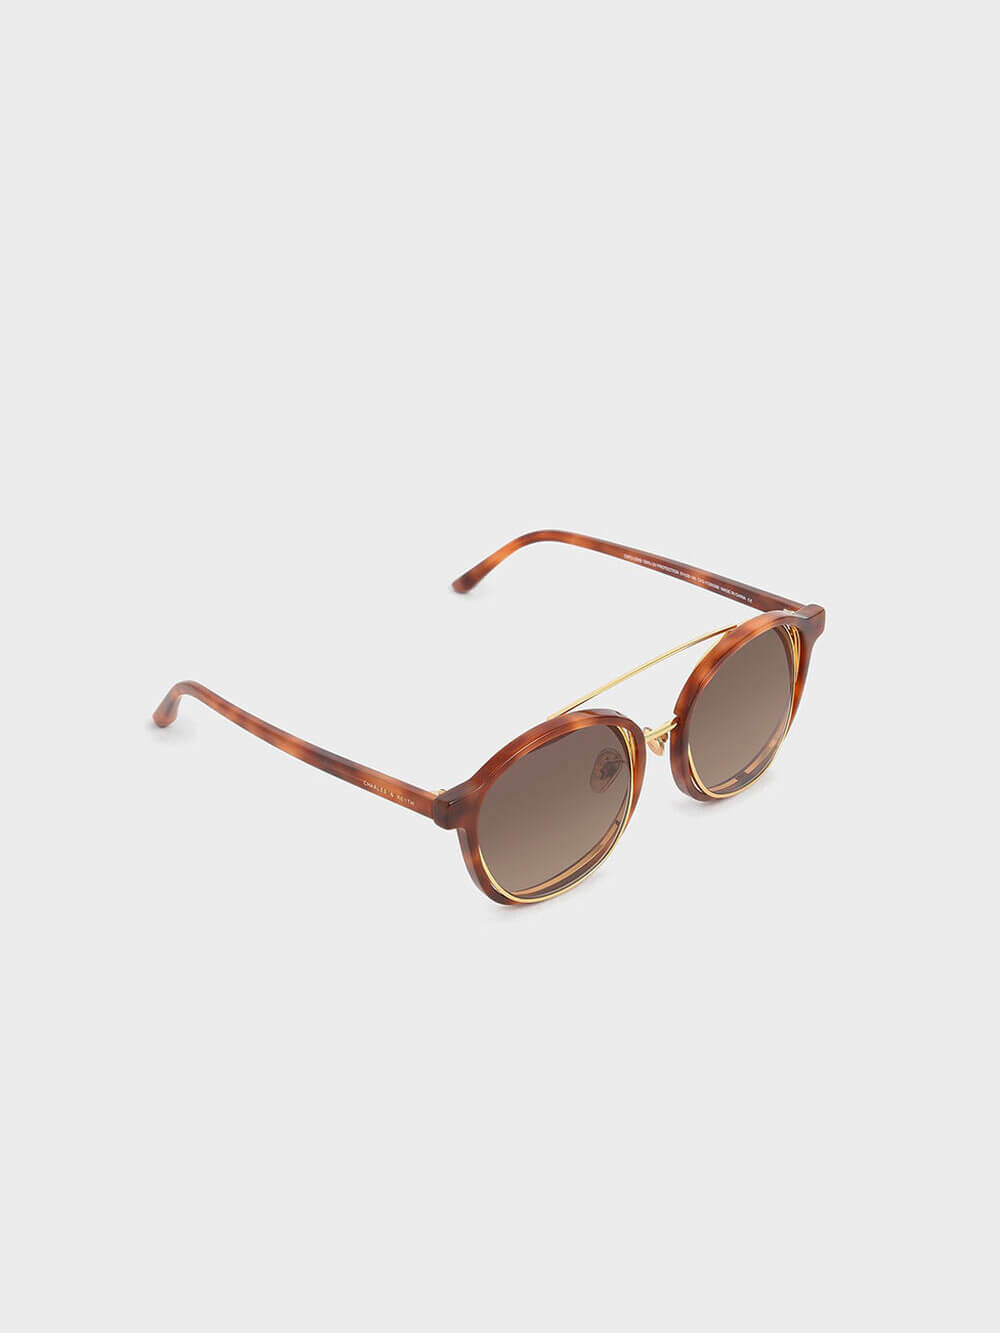 Tortoiseshell Gradient Tint Round Sunglasses